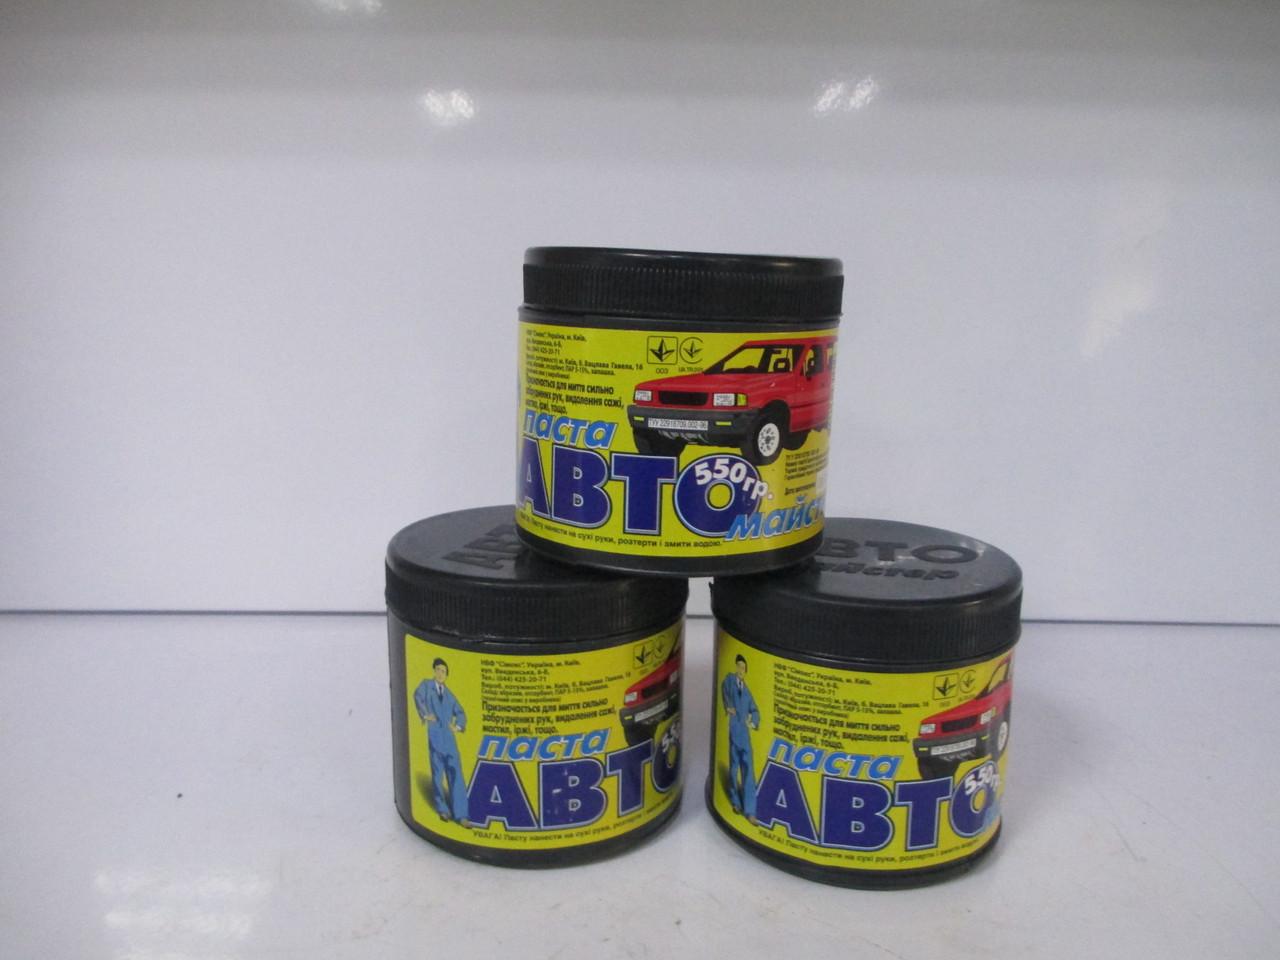 Паста для мытья рук Авто-мастер, банка 550 г